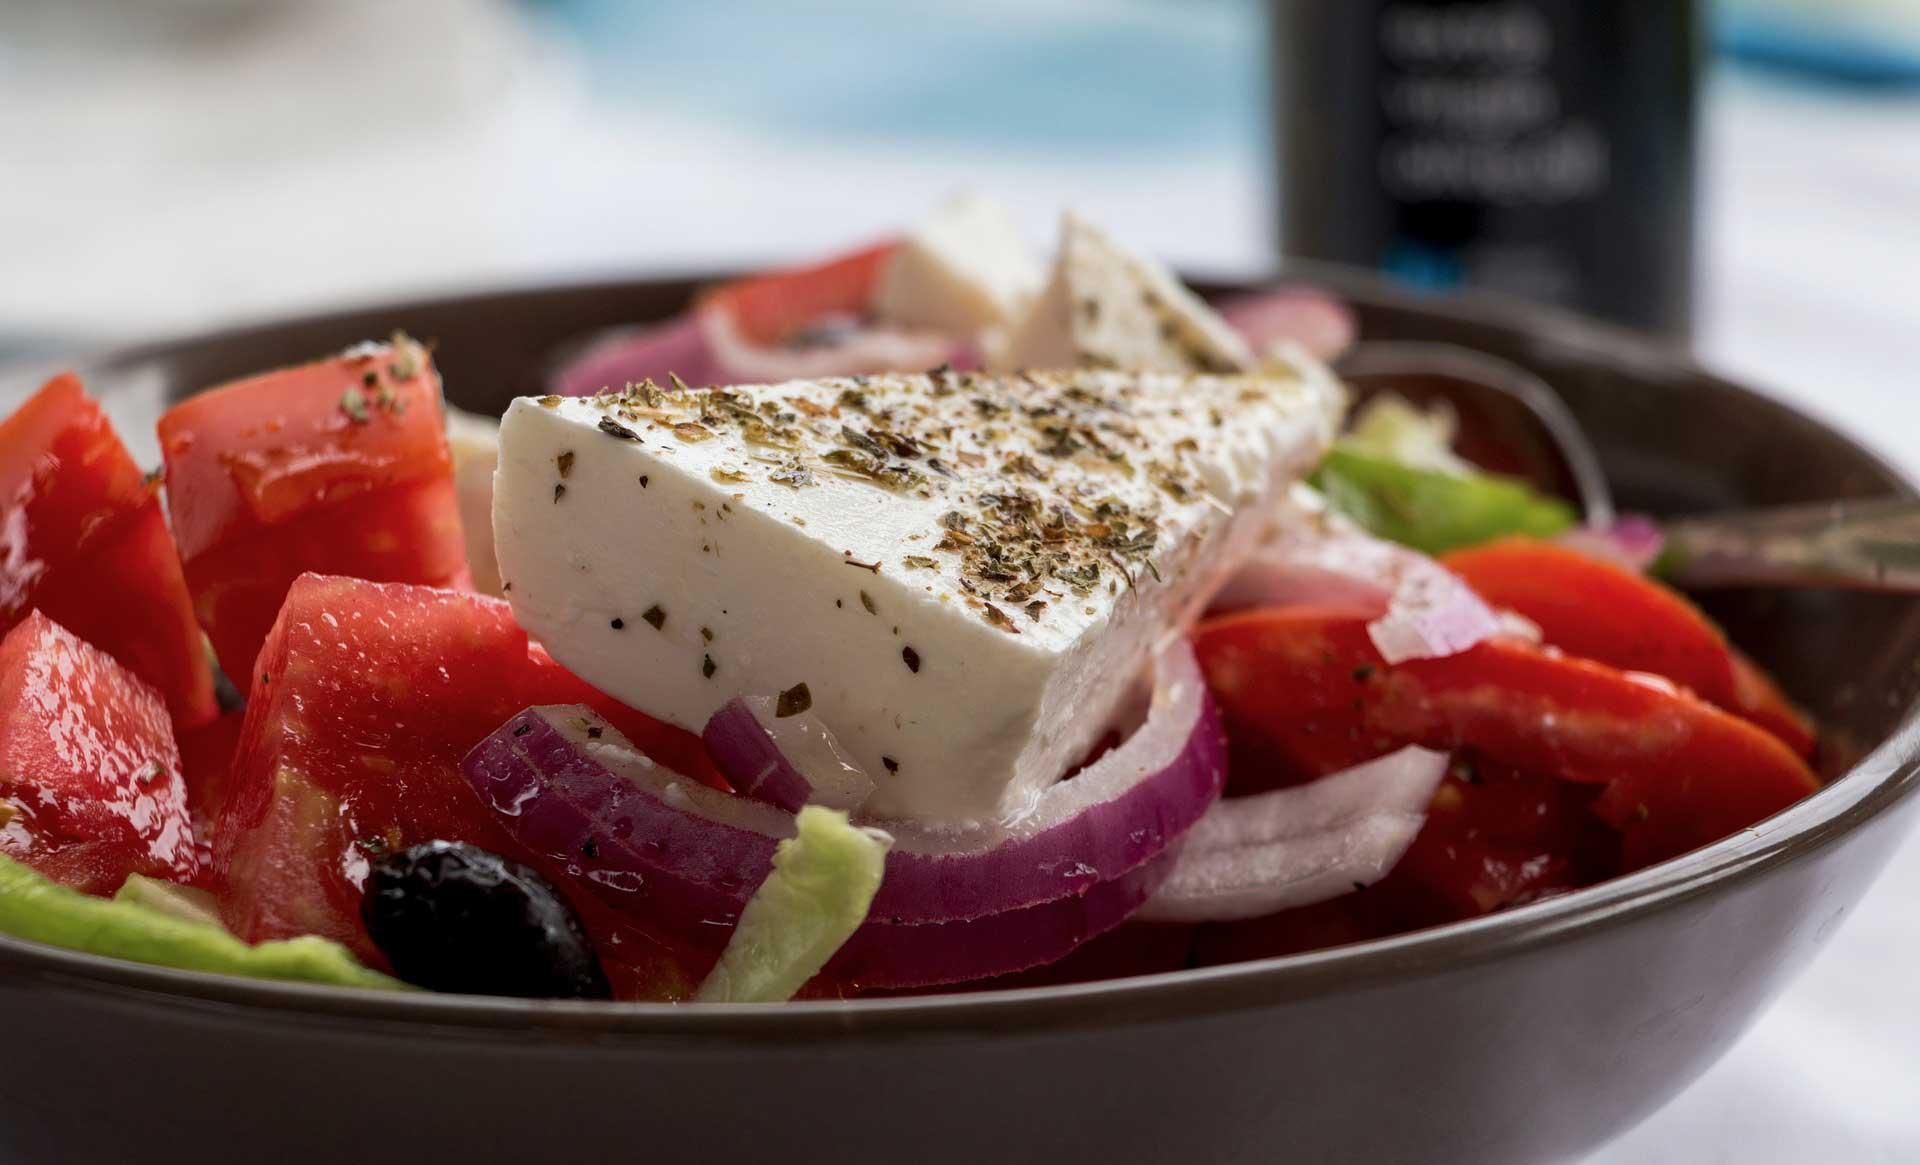 greek-salad-Athens-food-tour-ensalada-griega-tour-gastronomico-por-Atenas